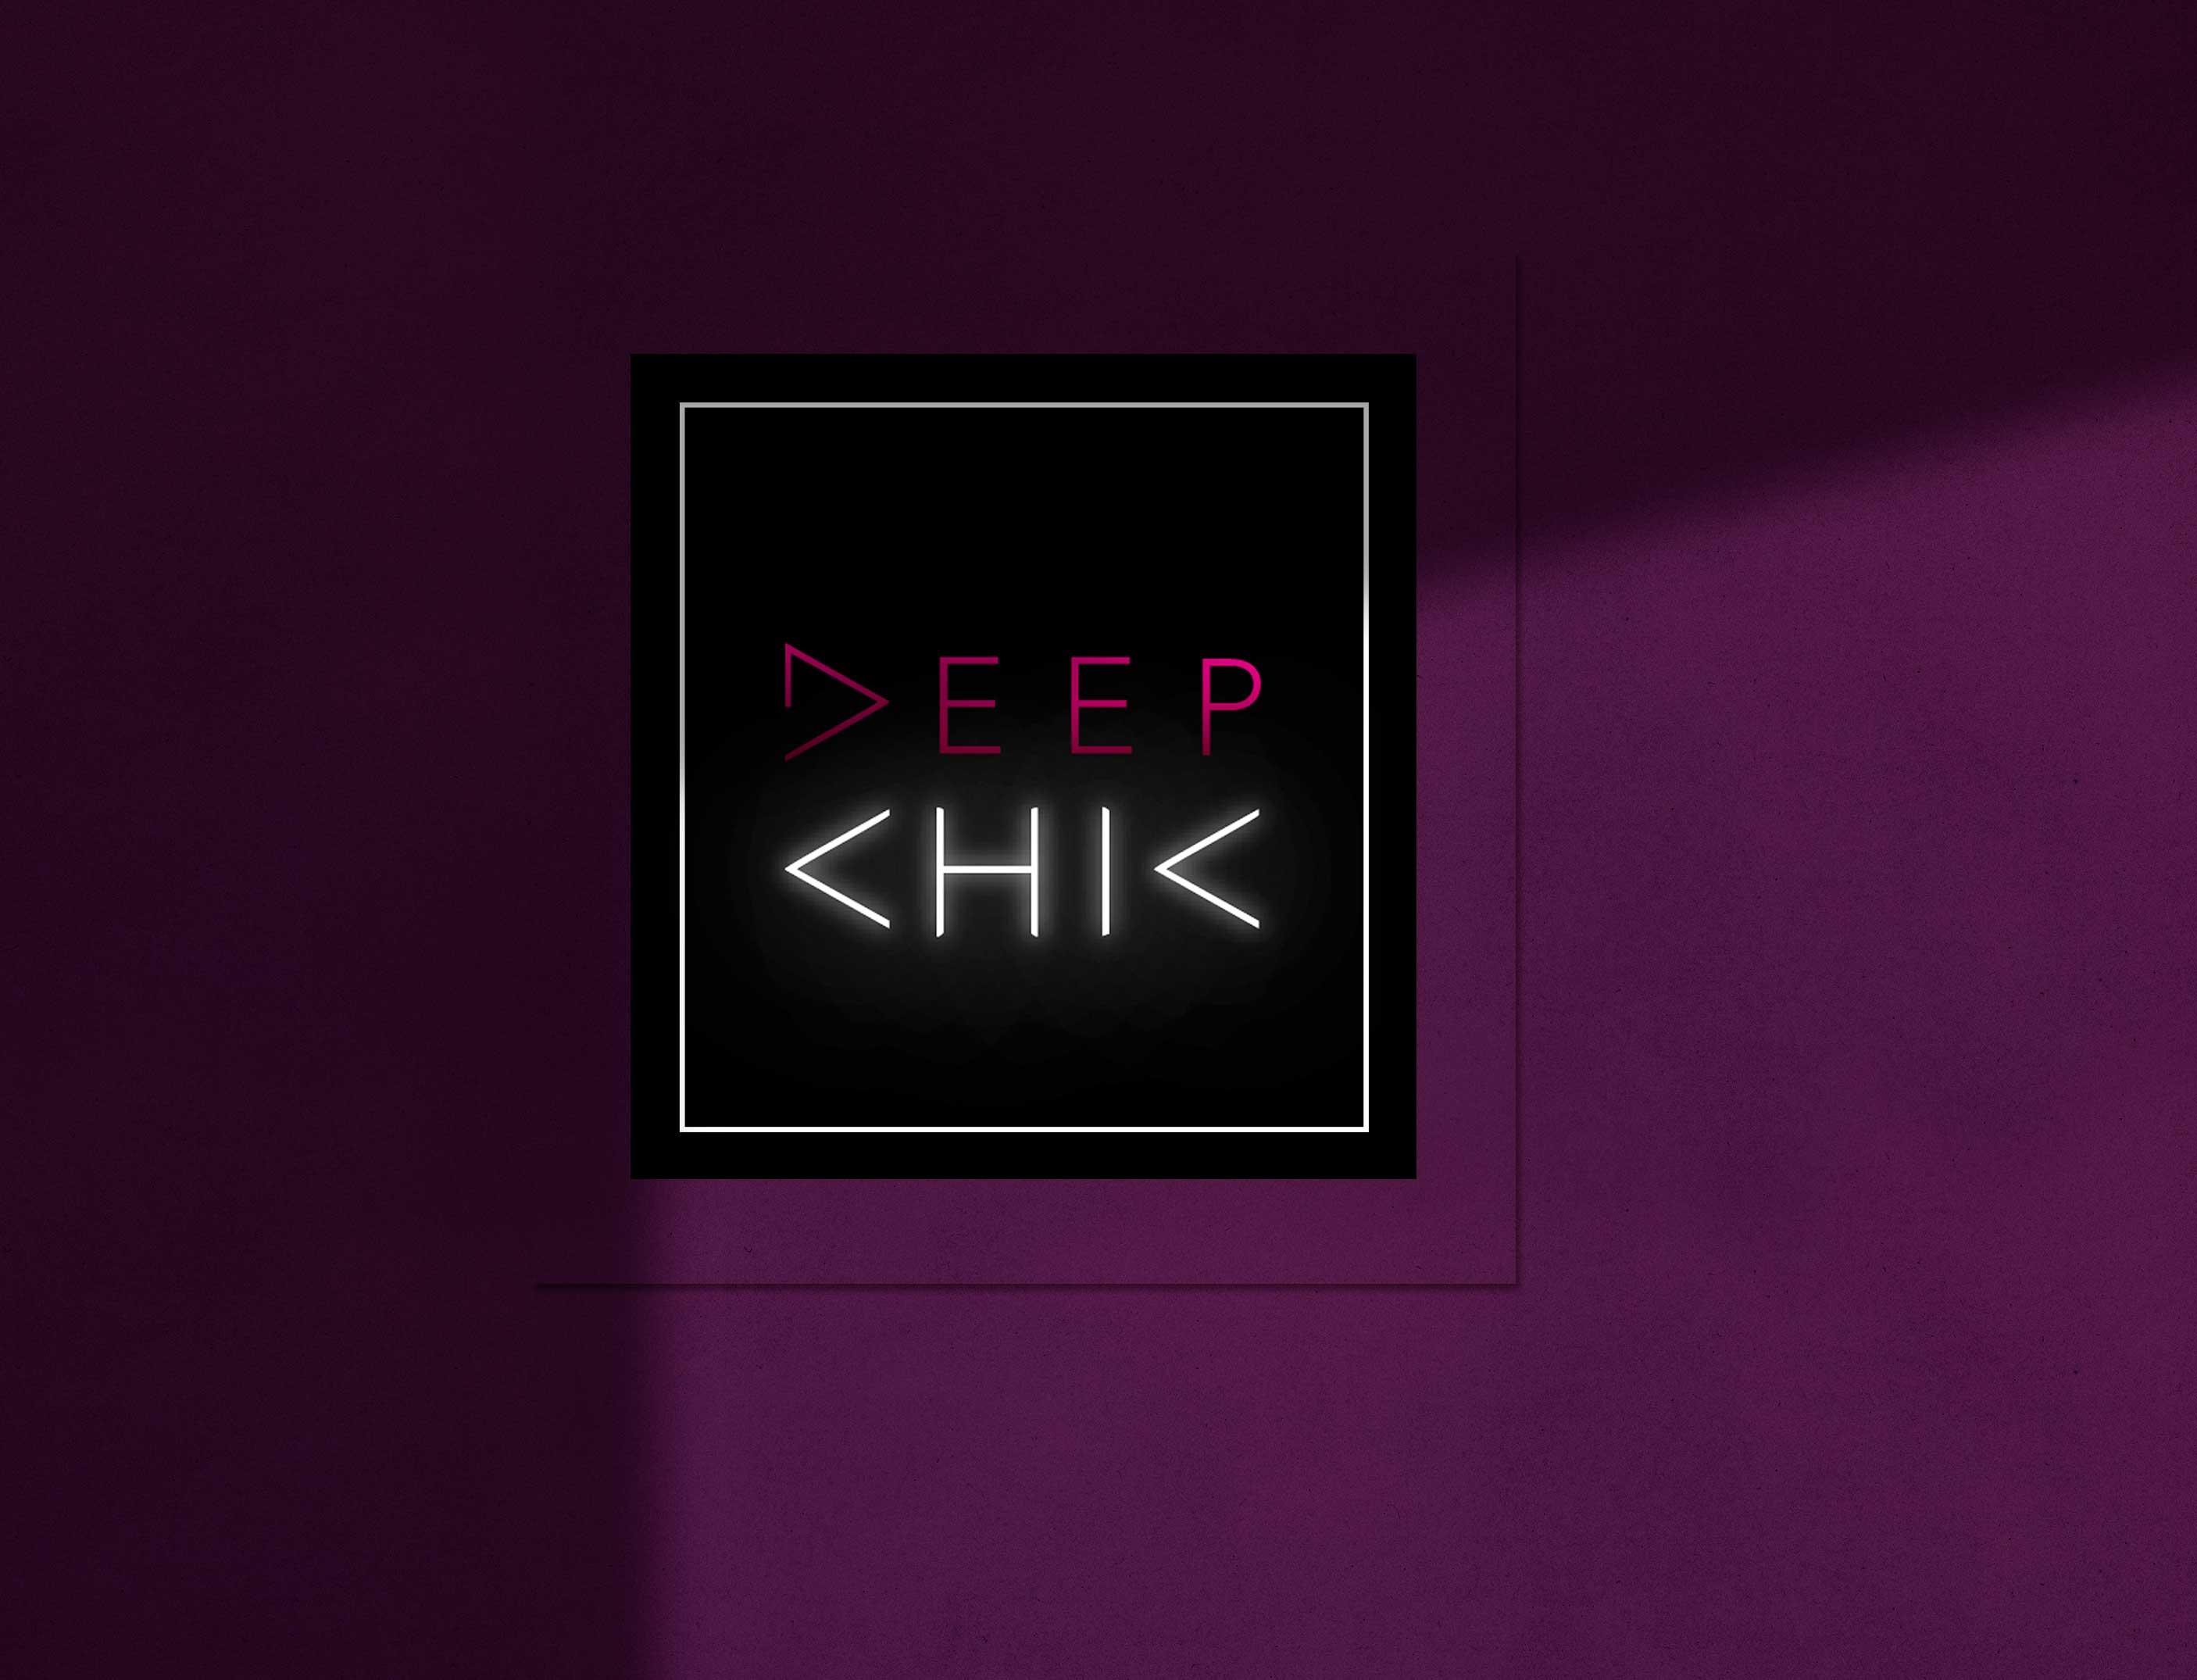 Deep Chic